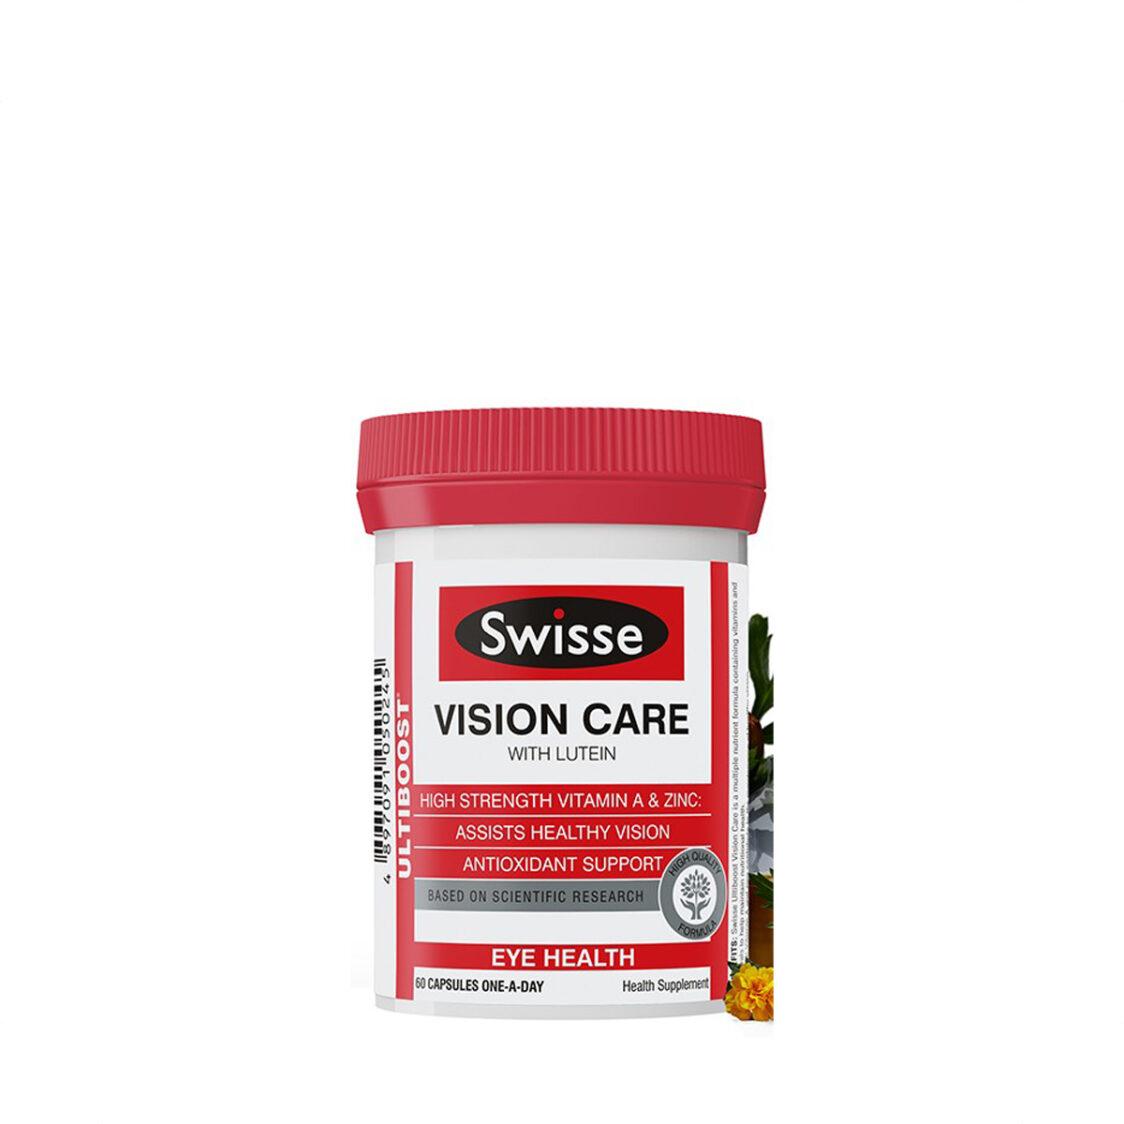 Swisse Ultiboost Vision Care 60s